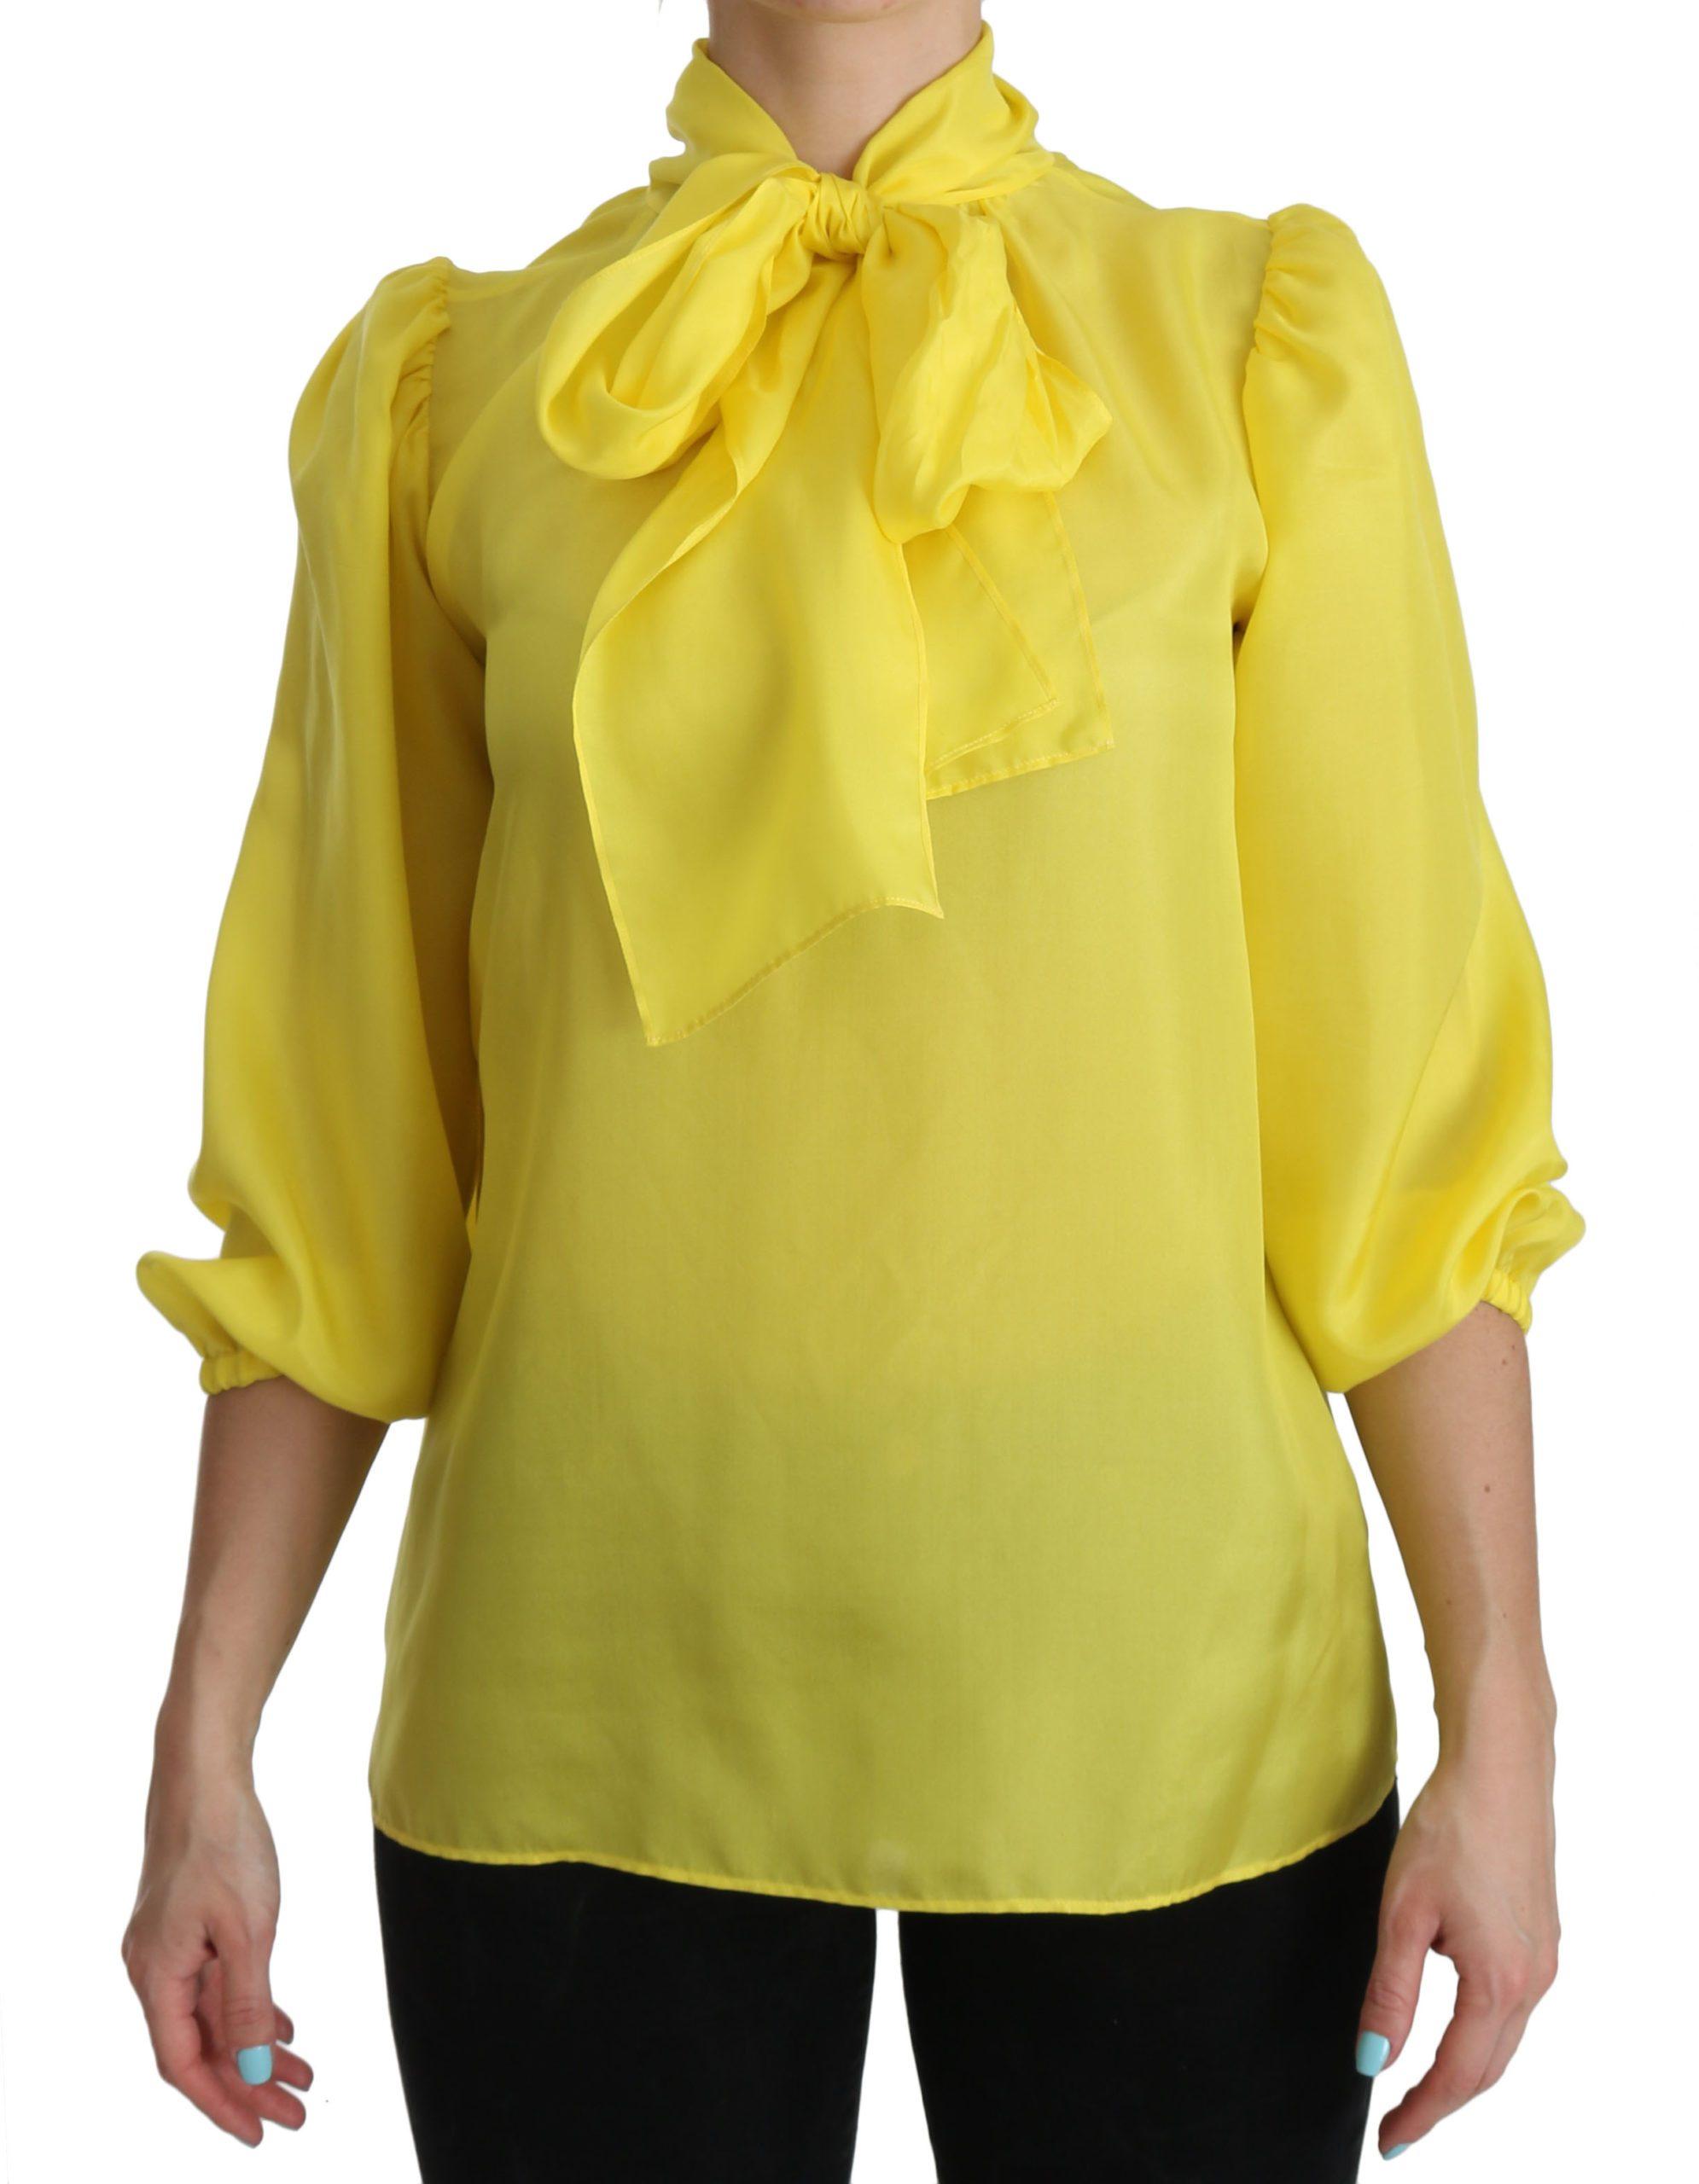 Dolce & Gabbana Women's 3/4 Sleeves Ribbon Top Yellow TSH3877 - IT38 XS